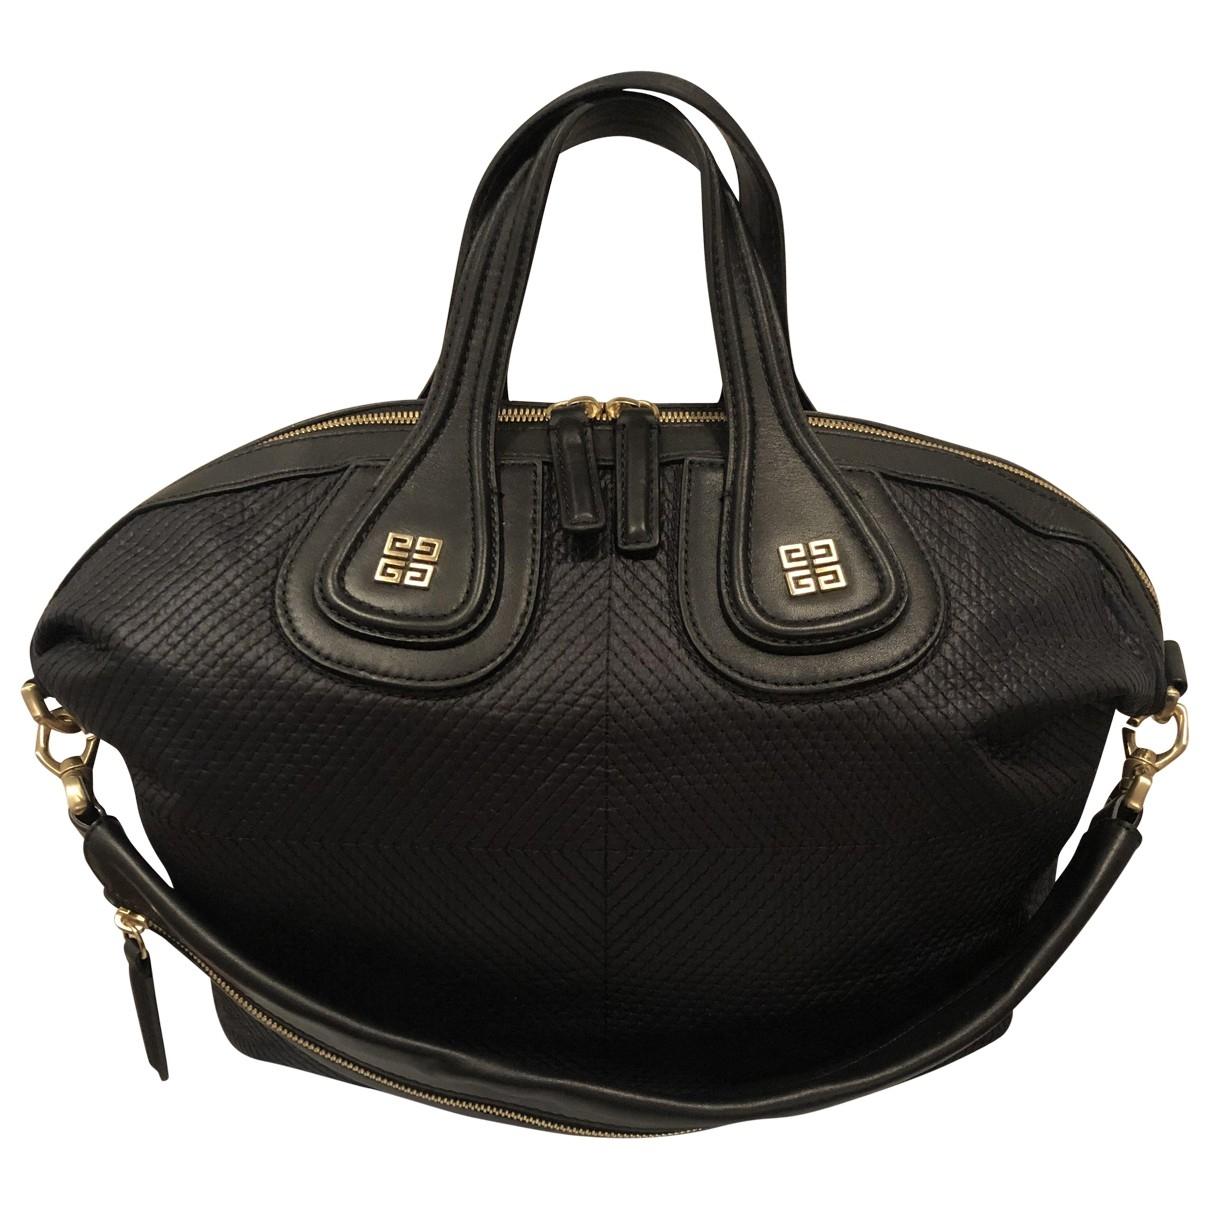 Givenchy - Sac a main Nightingale pour femme - noir